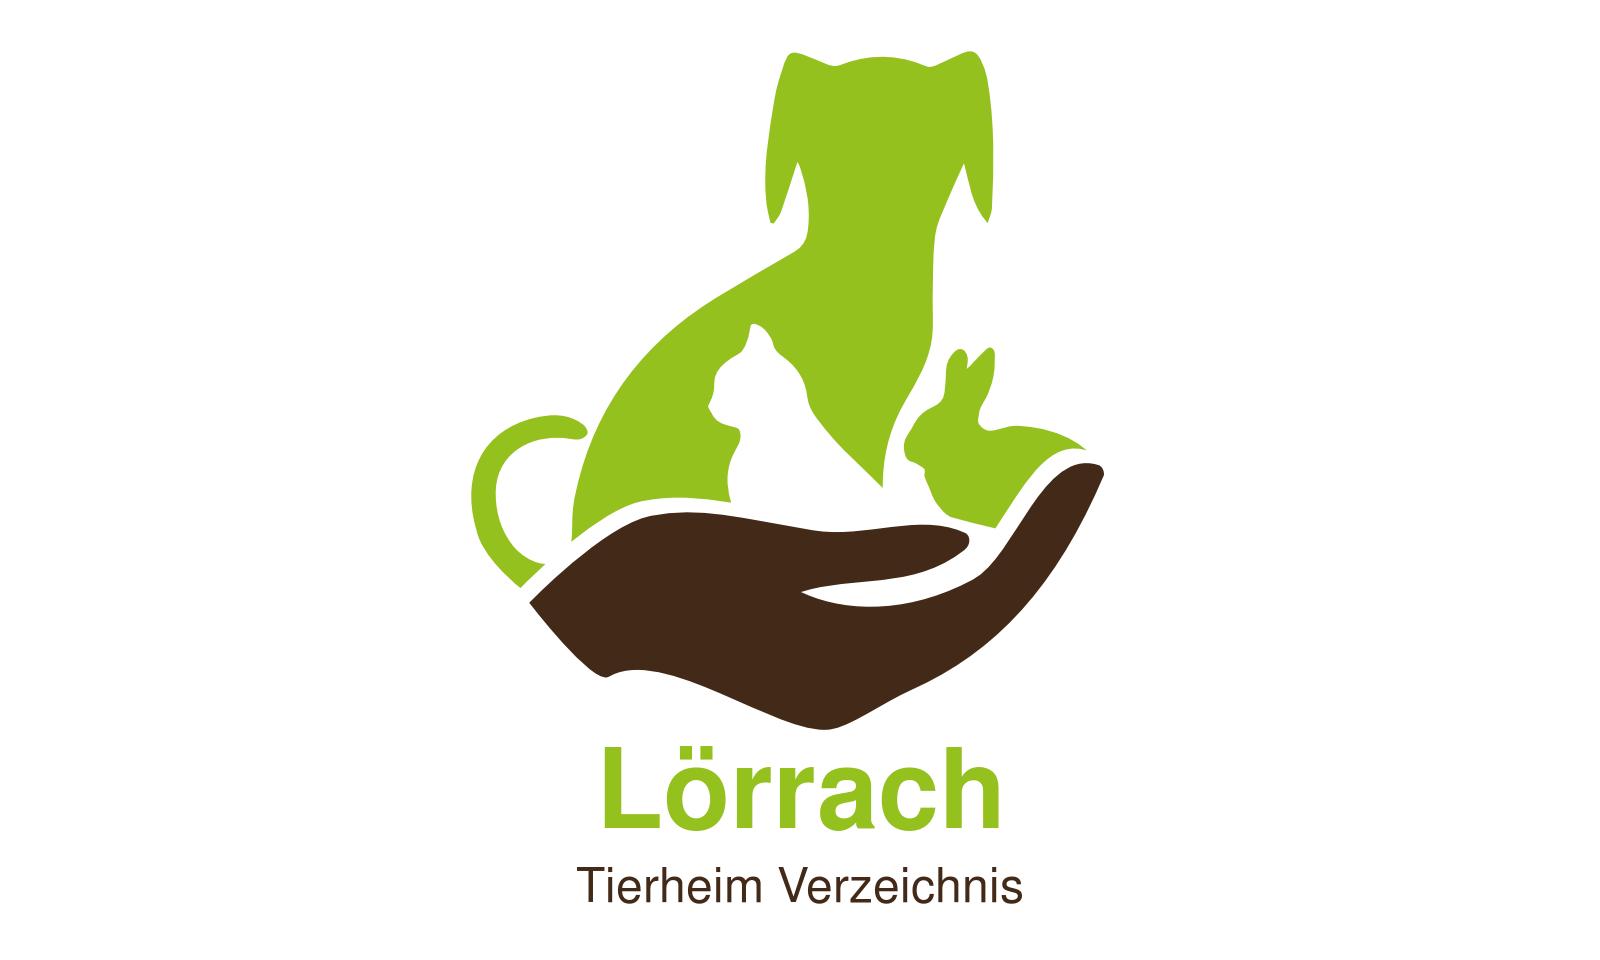 Tierheim Lörrach